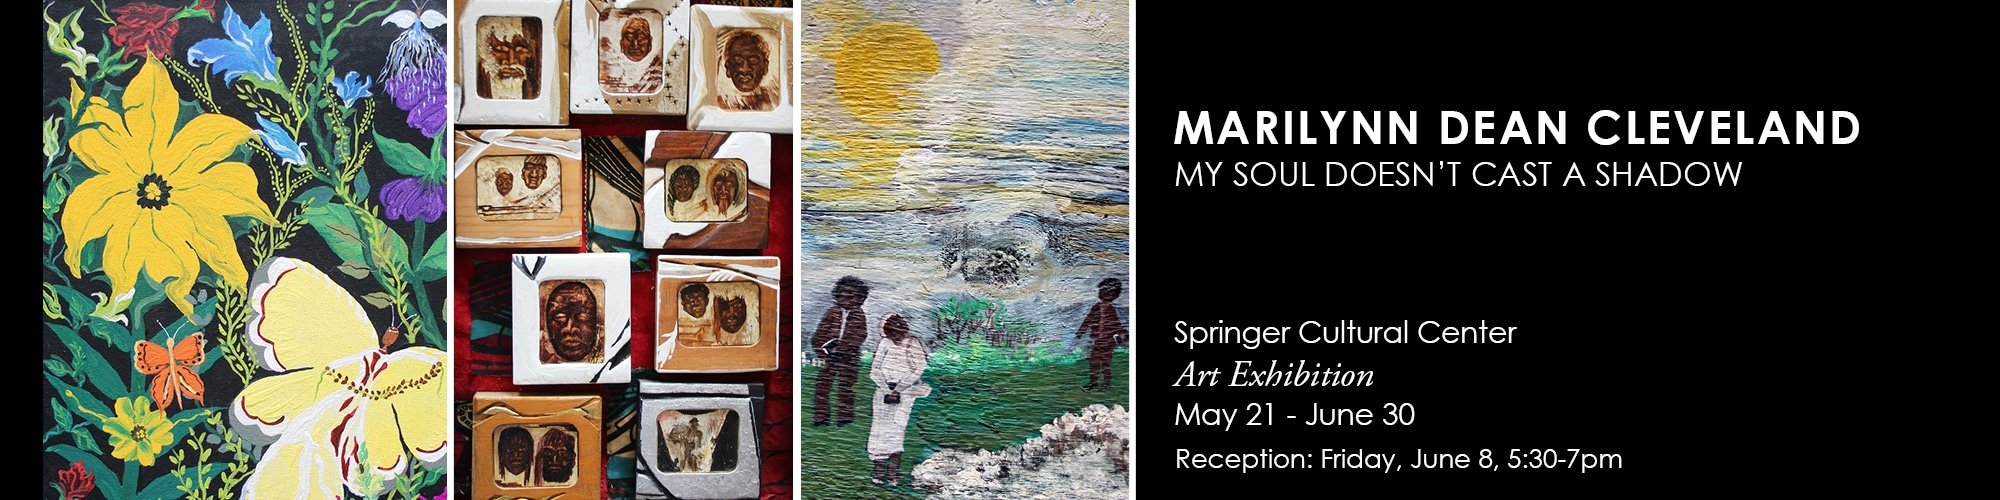 Art-Exhibit-2000x500-slider-May18